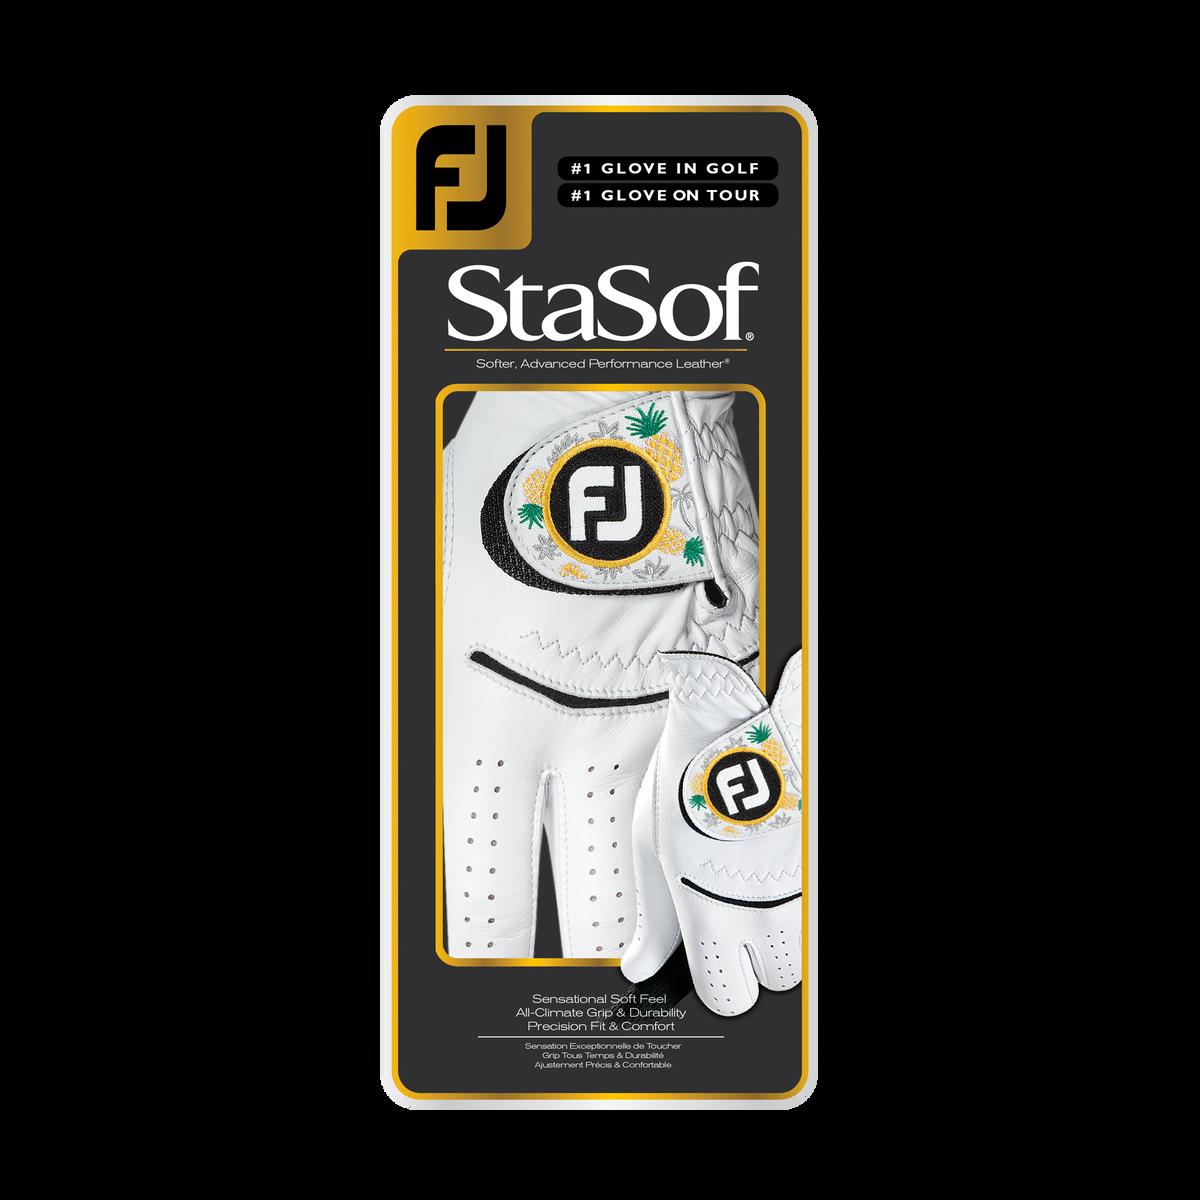 StaSof Limited Edition